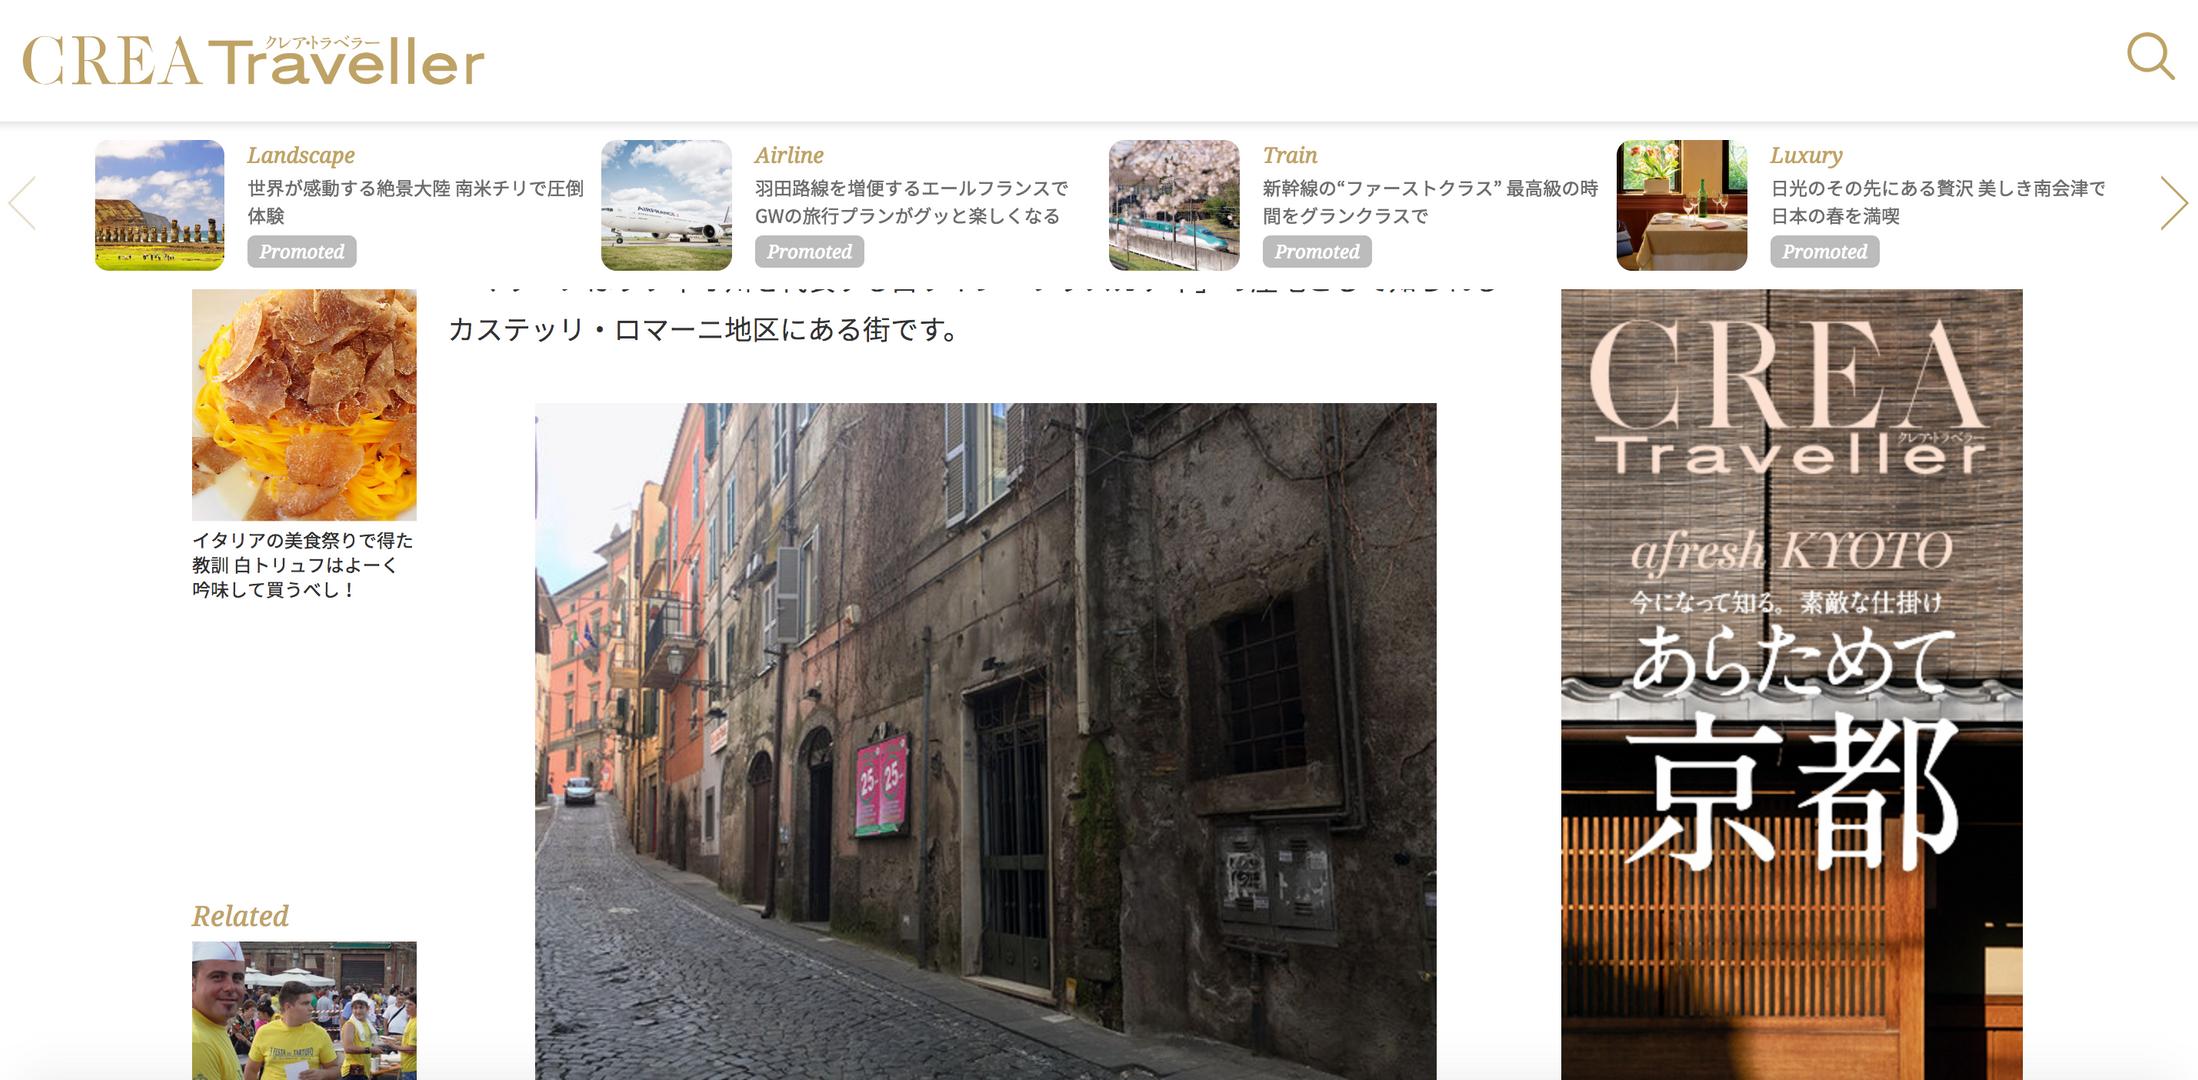 Bunshun_Japan_ Yukie Muramoto_Fungaia_Mo